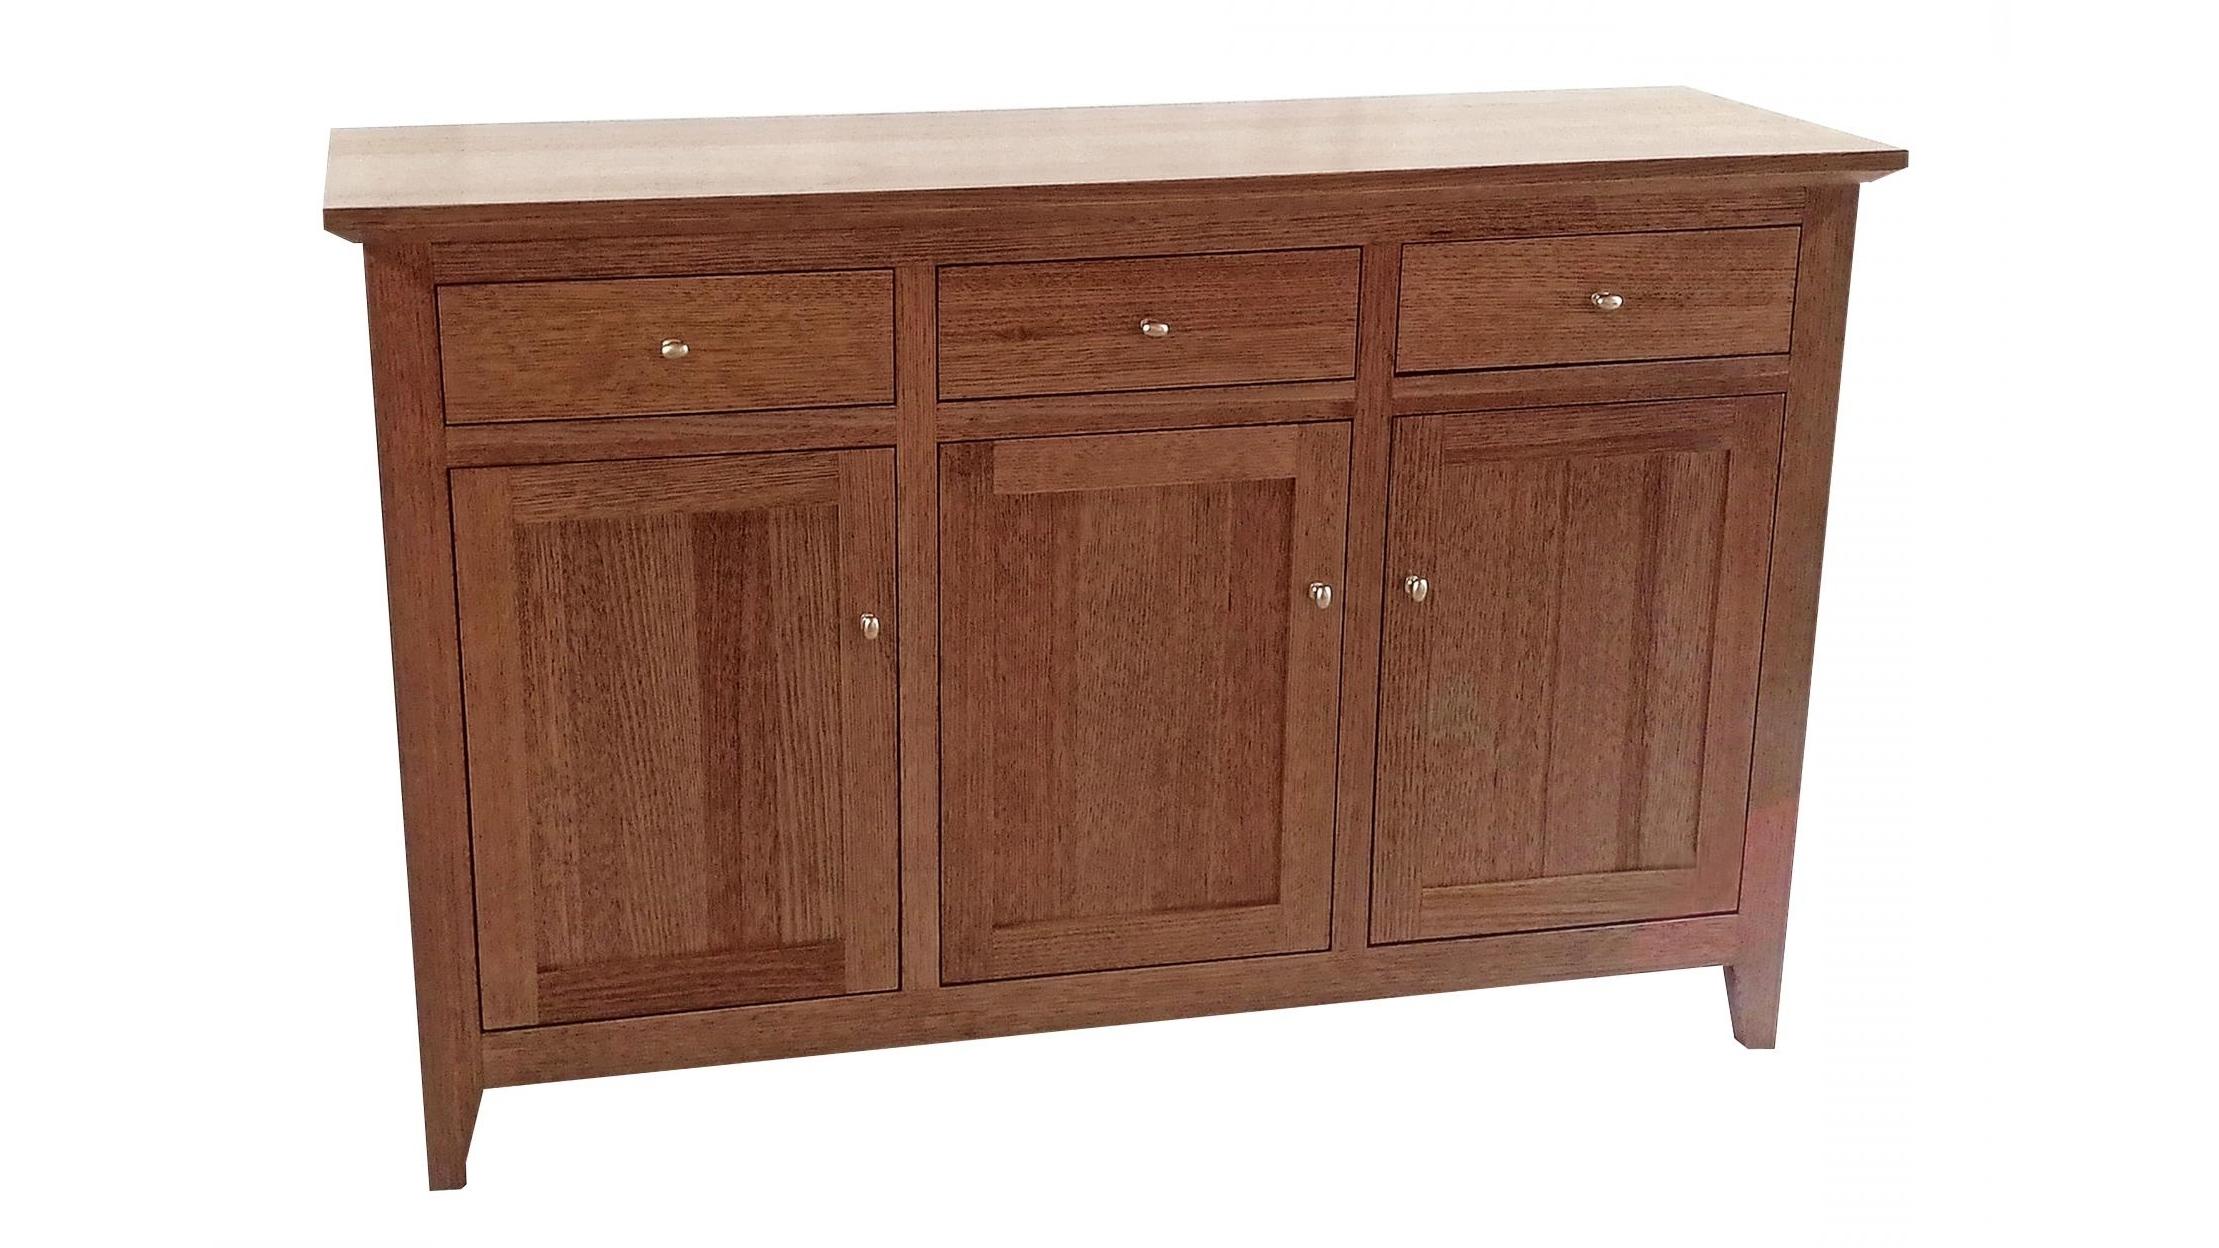 Buy Claremont Buffet   Harvey Norman Au Regarding Espresso Wood Multi Use Buffets (View 10 of 20)